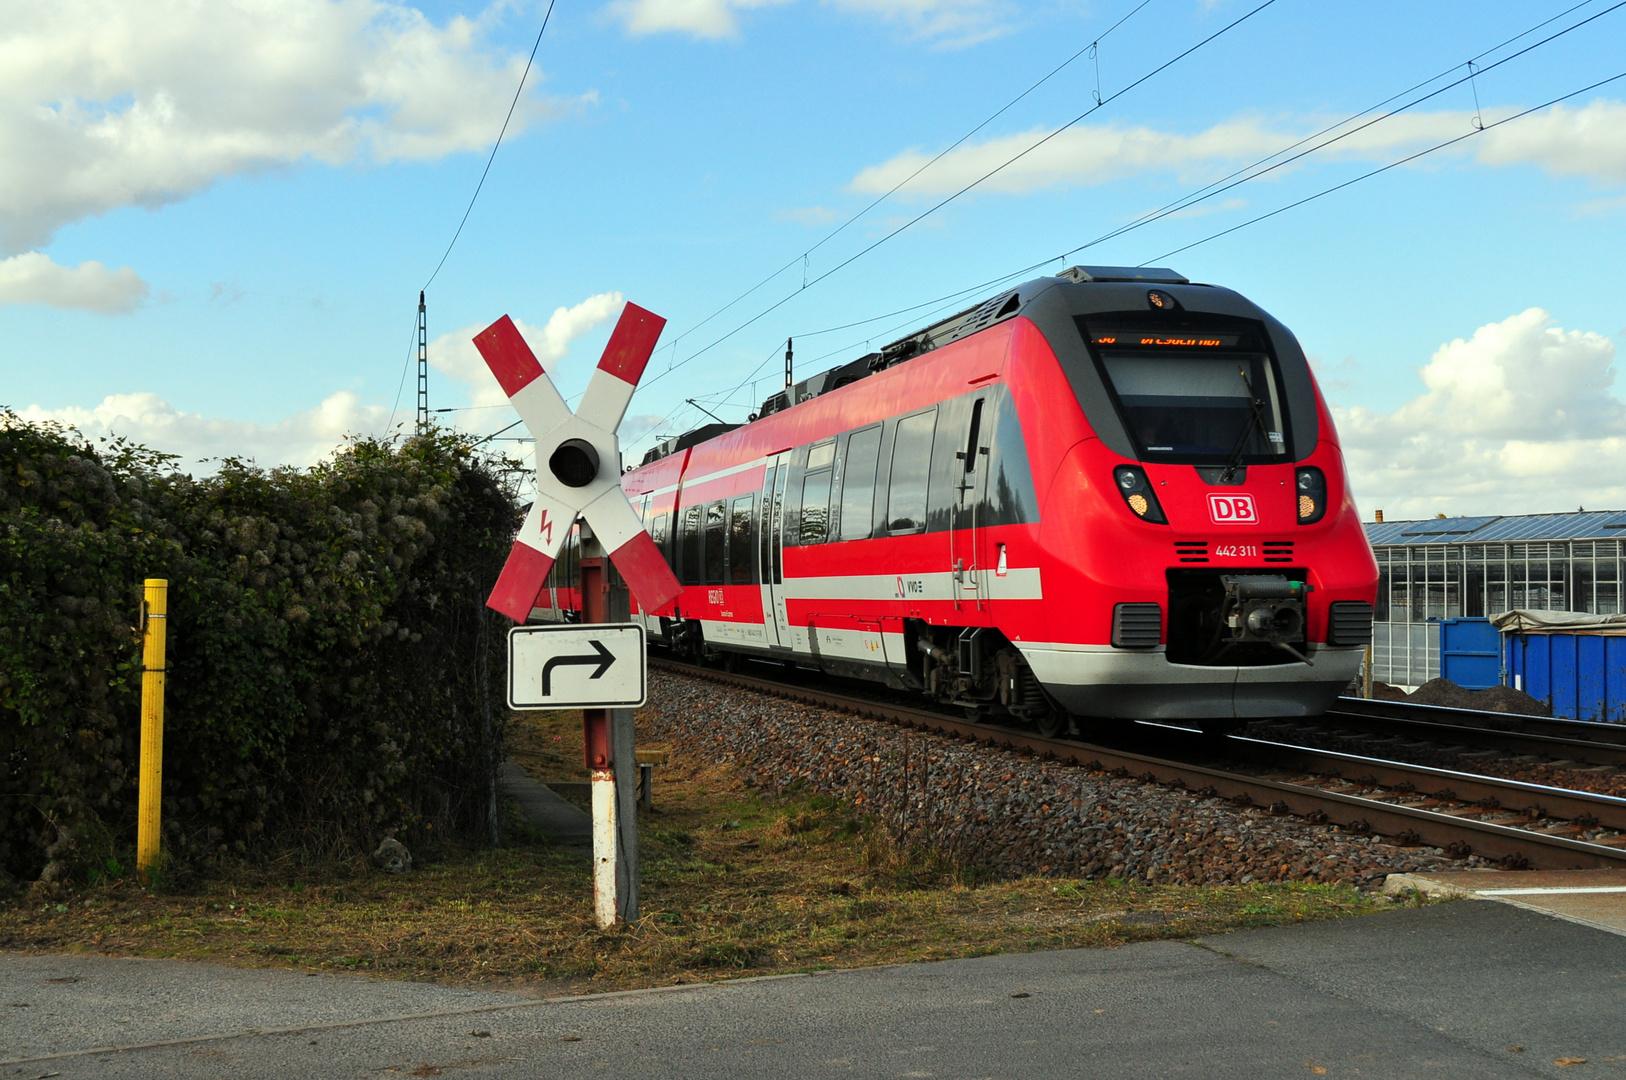 442 115 am Bahnübergang